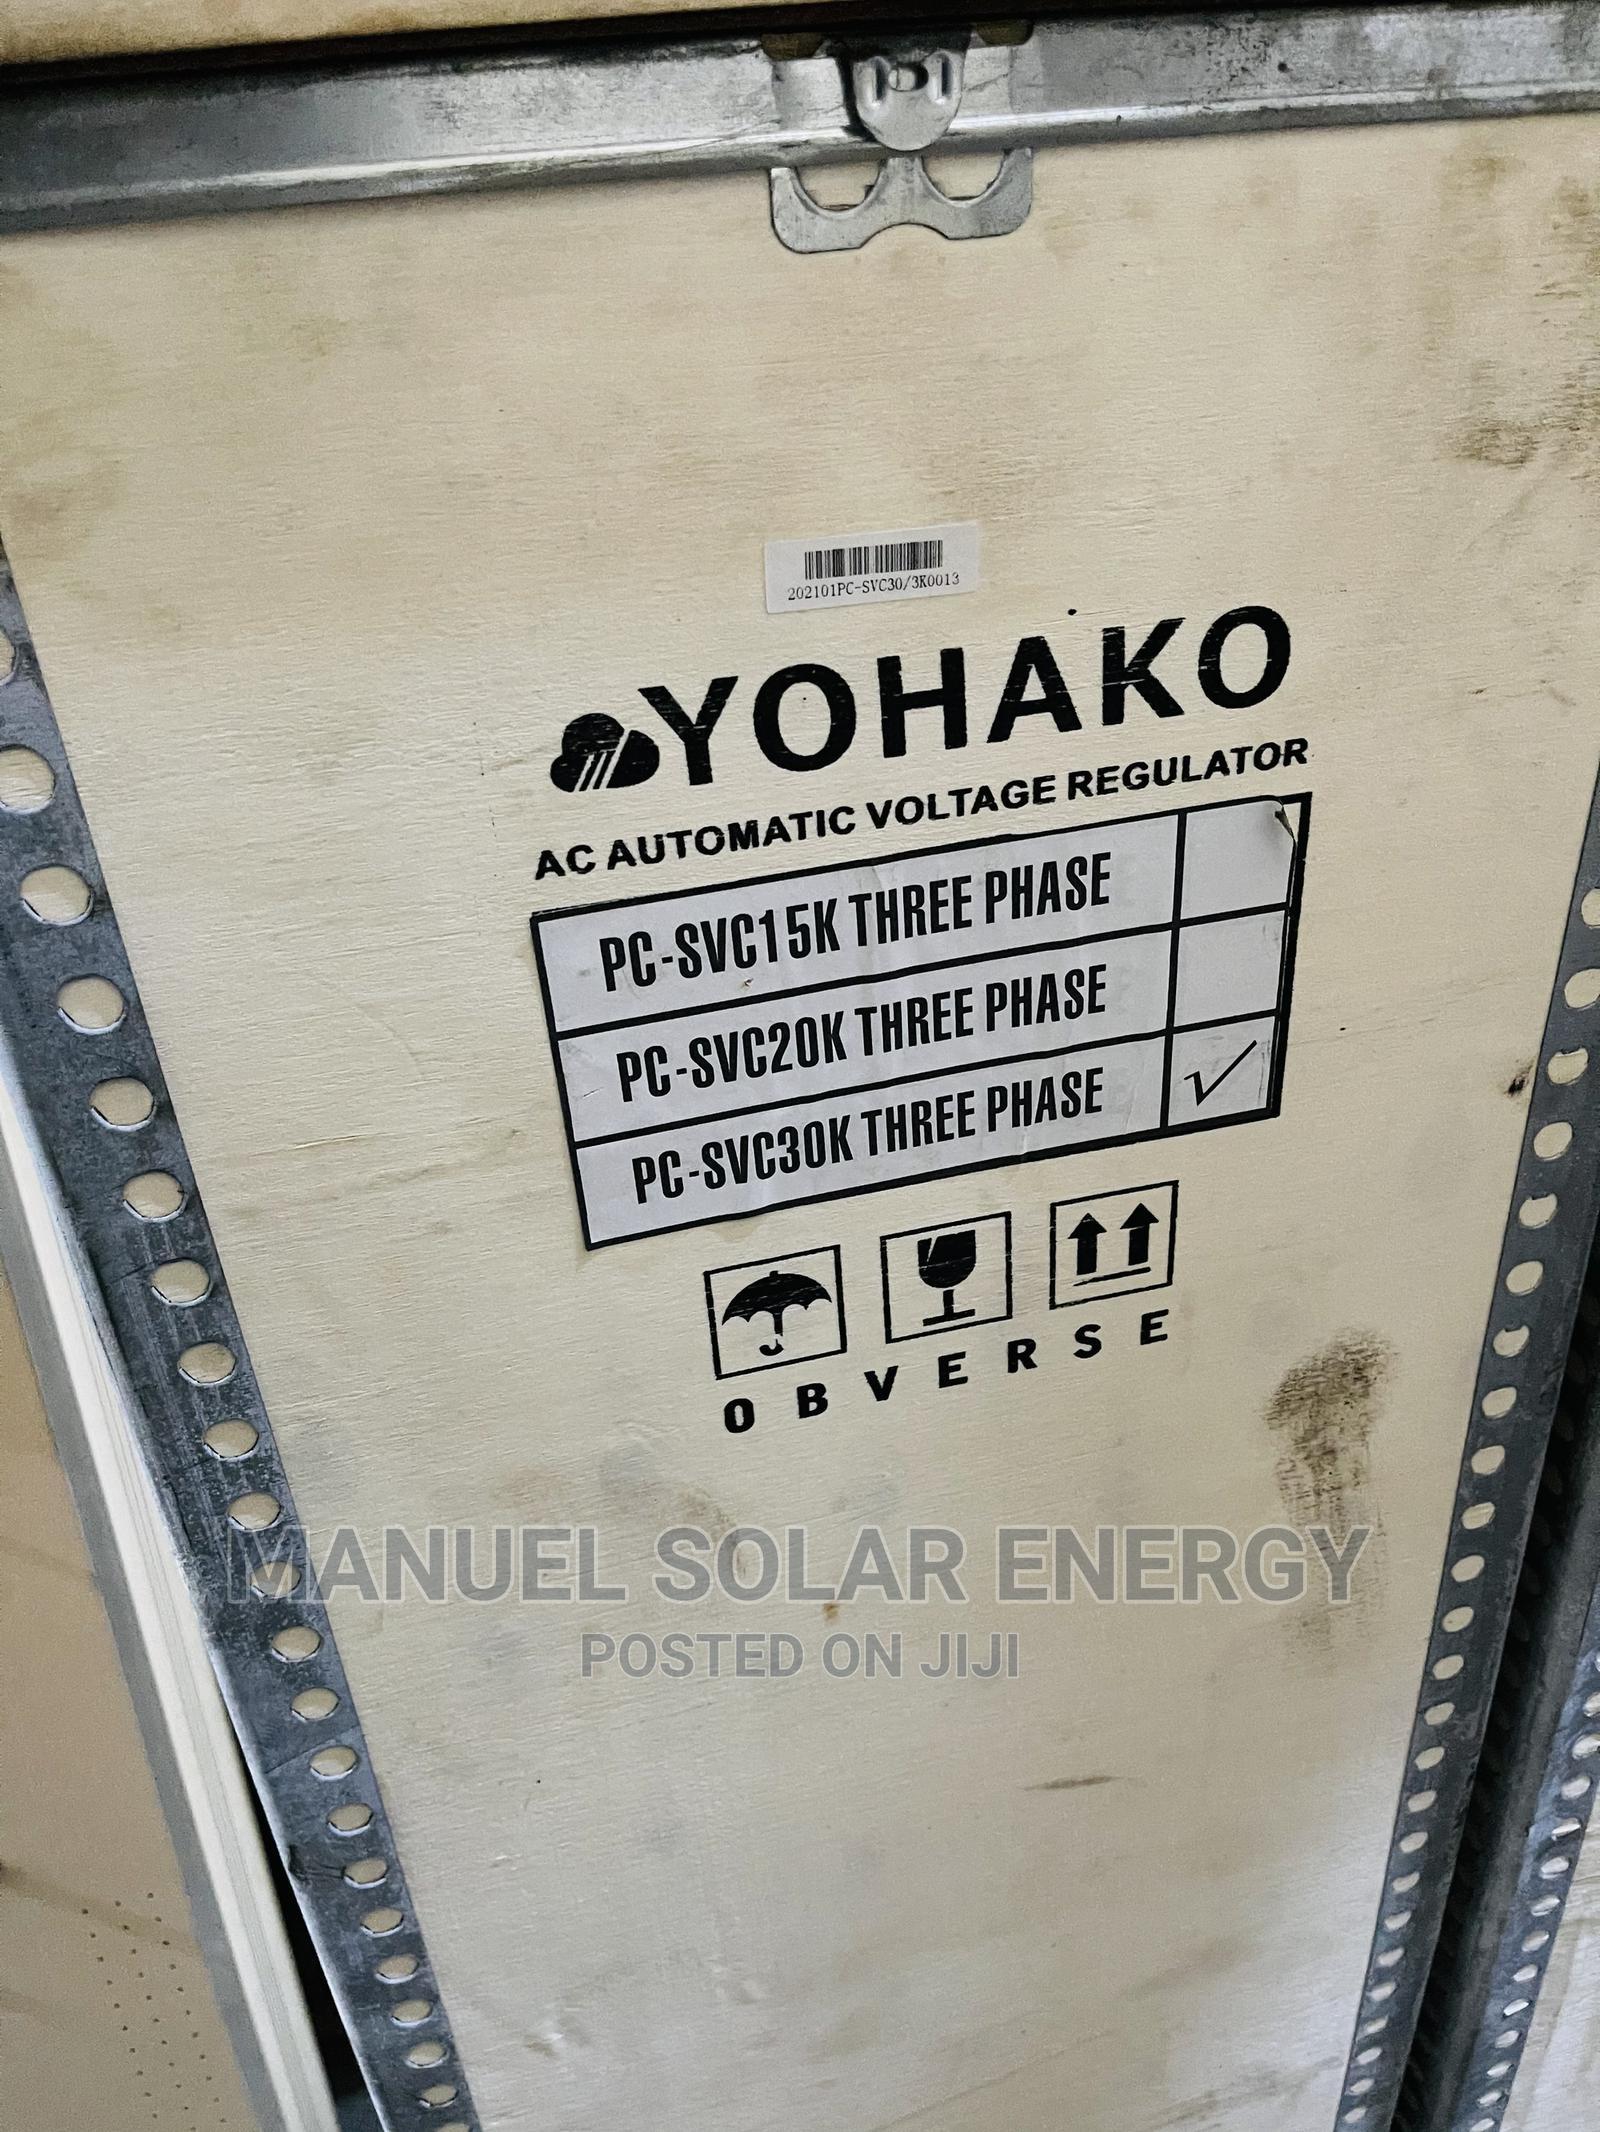 30kva 3 Phase Yohako Stabilizer Available With 1yr Warranty